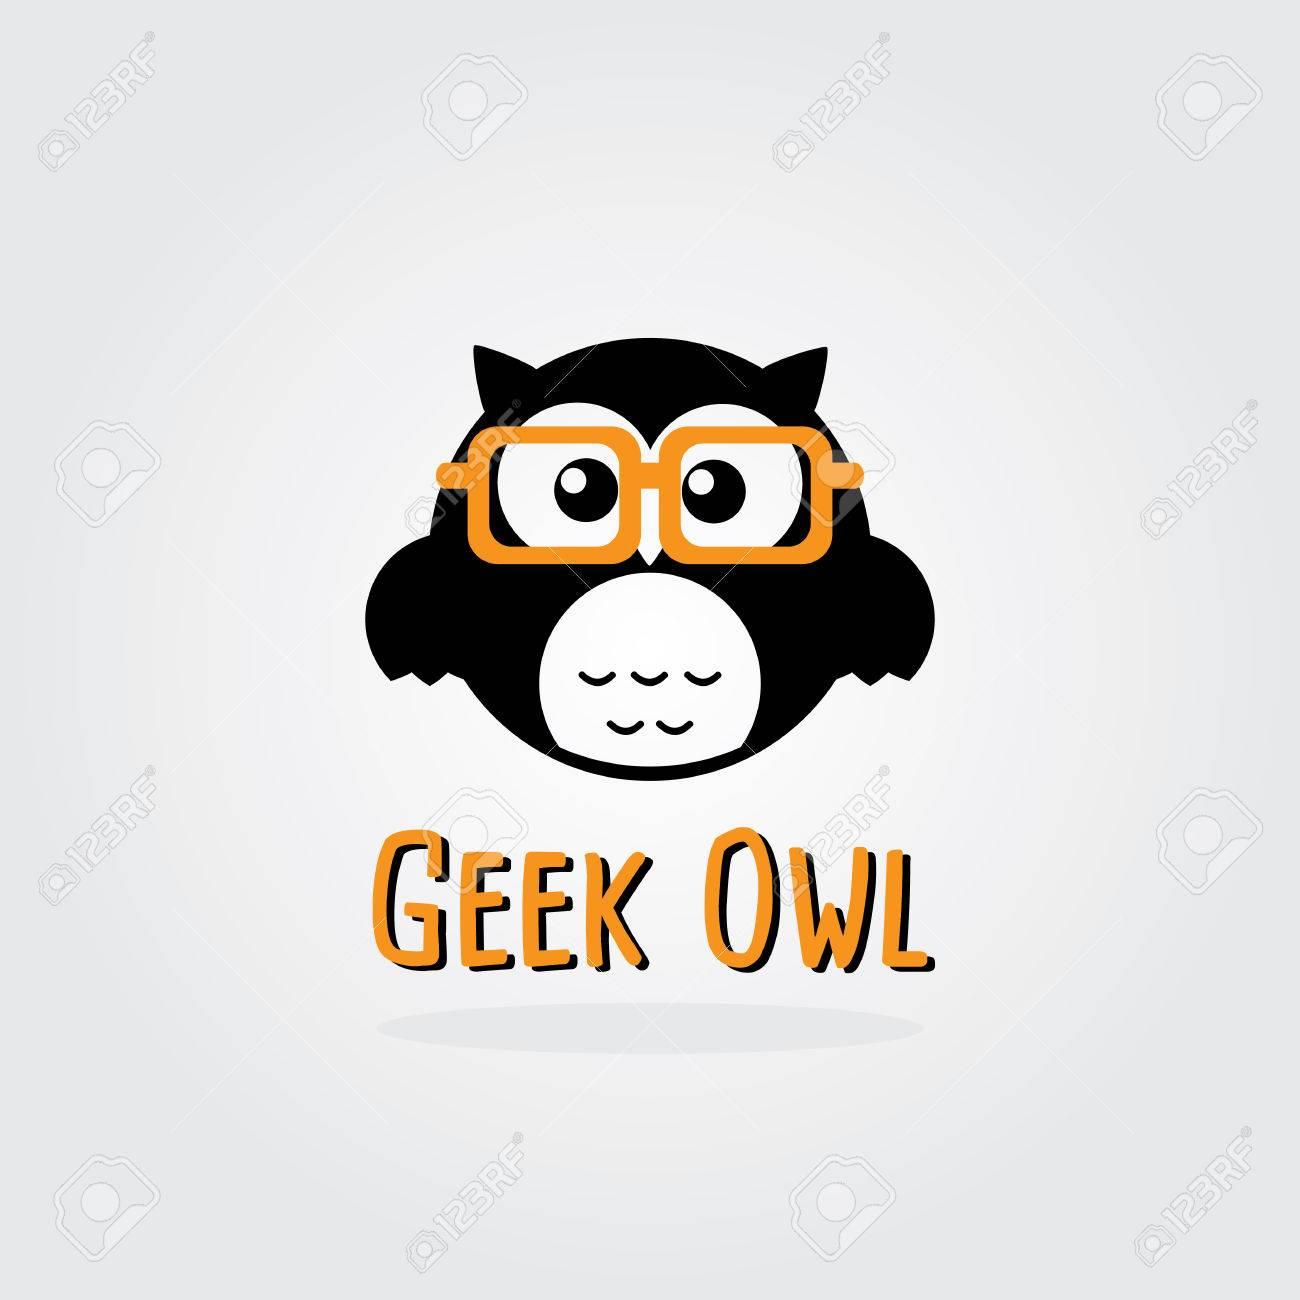 Geek Owl Vector Logo Template. Flat Design. Stock Vector. Royalty ...